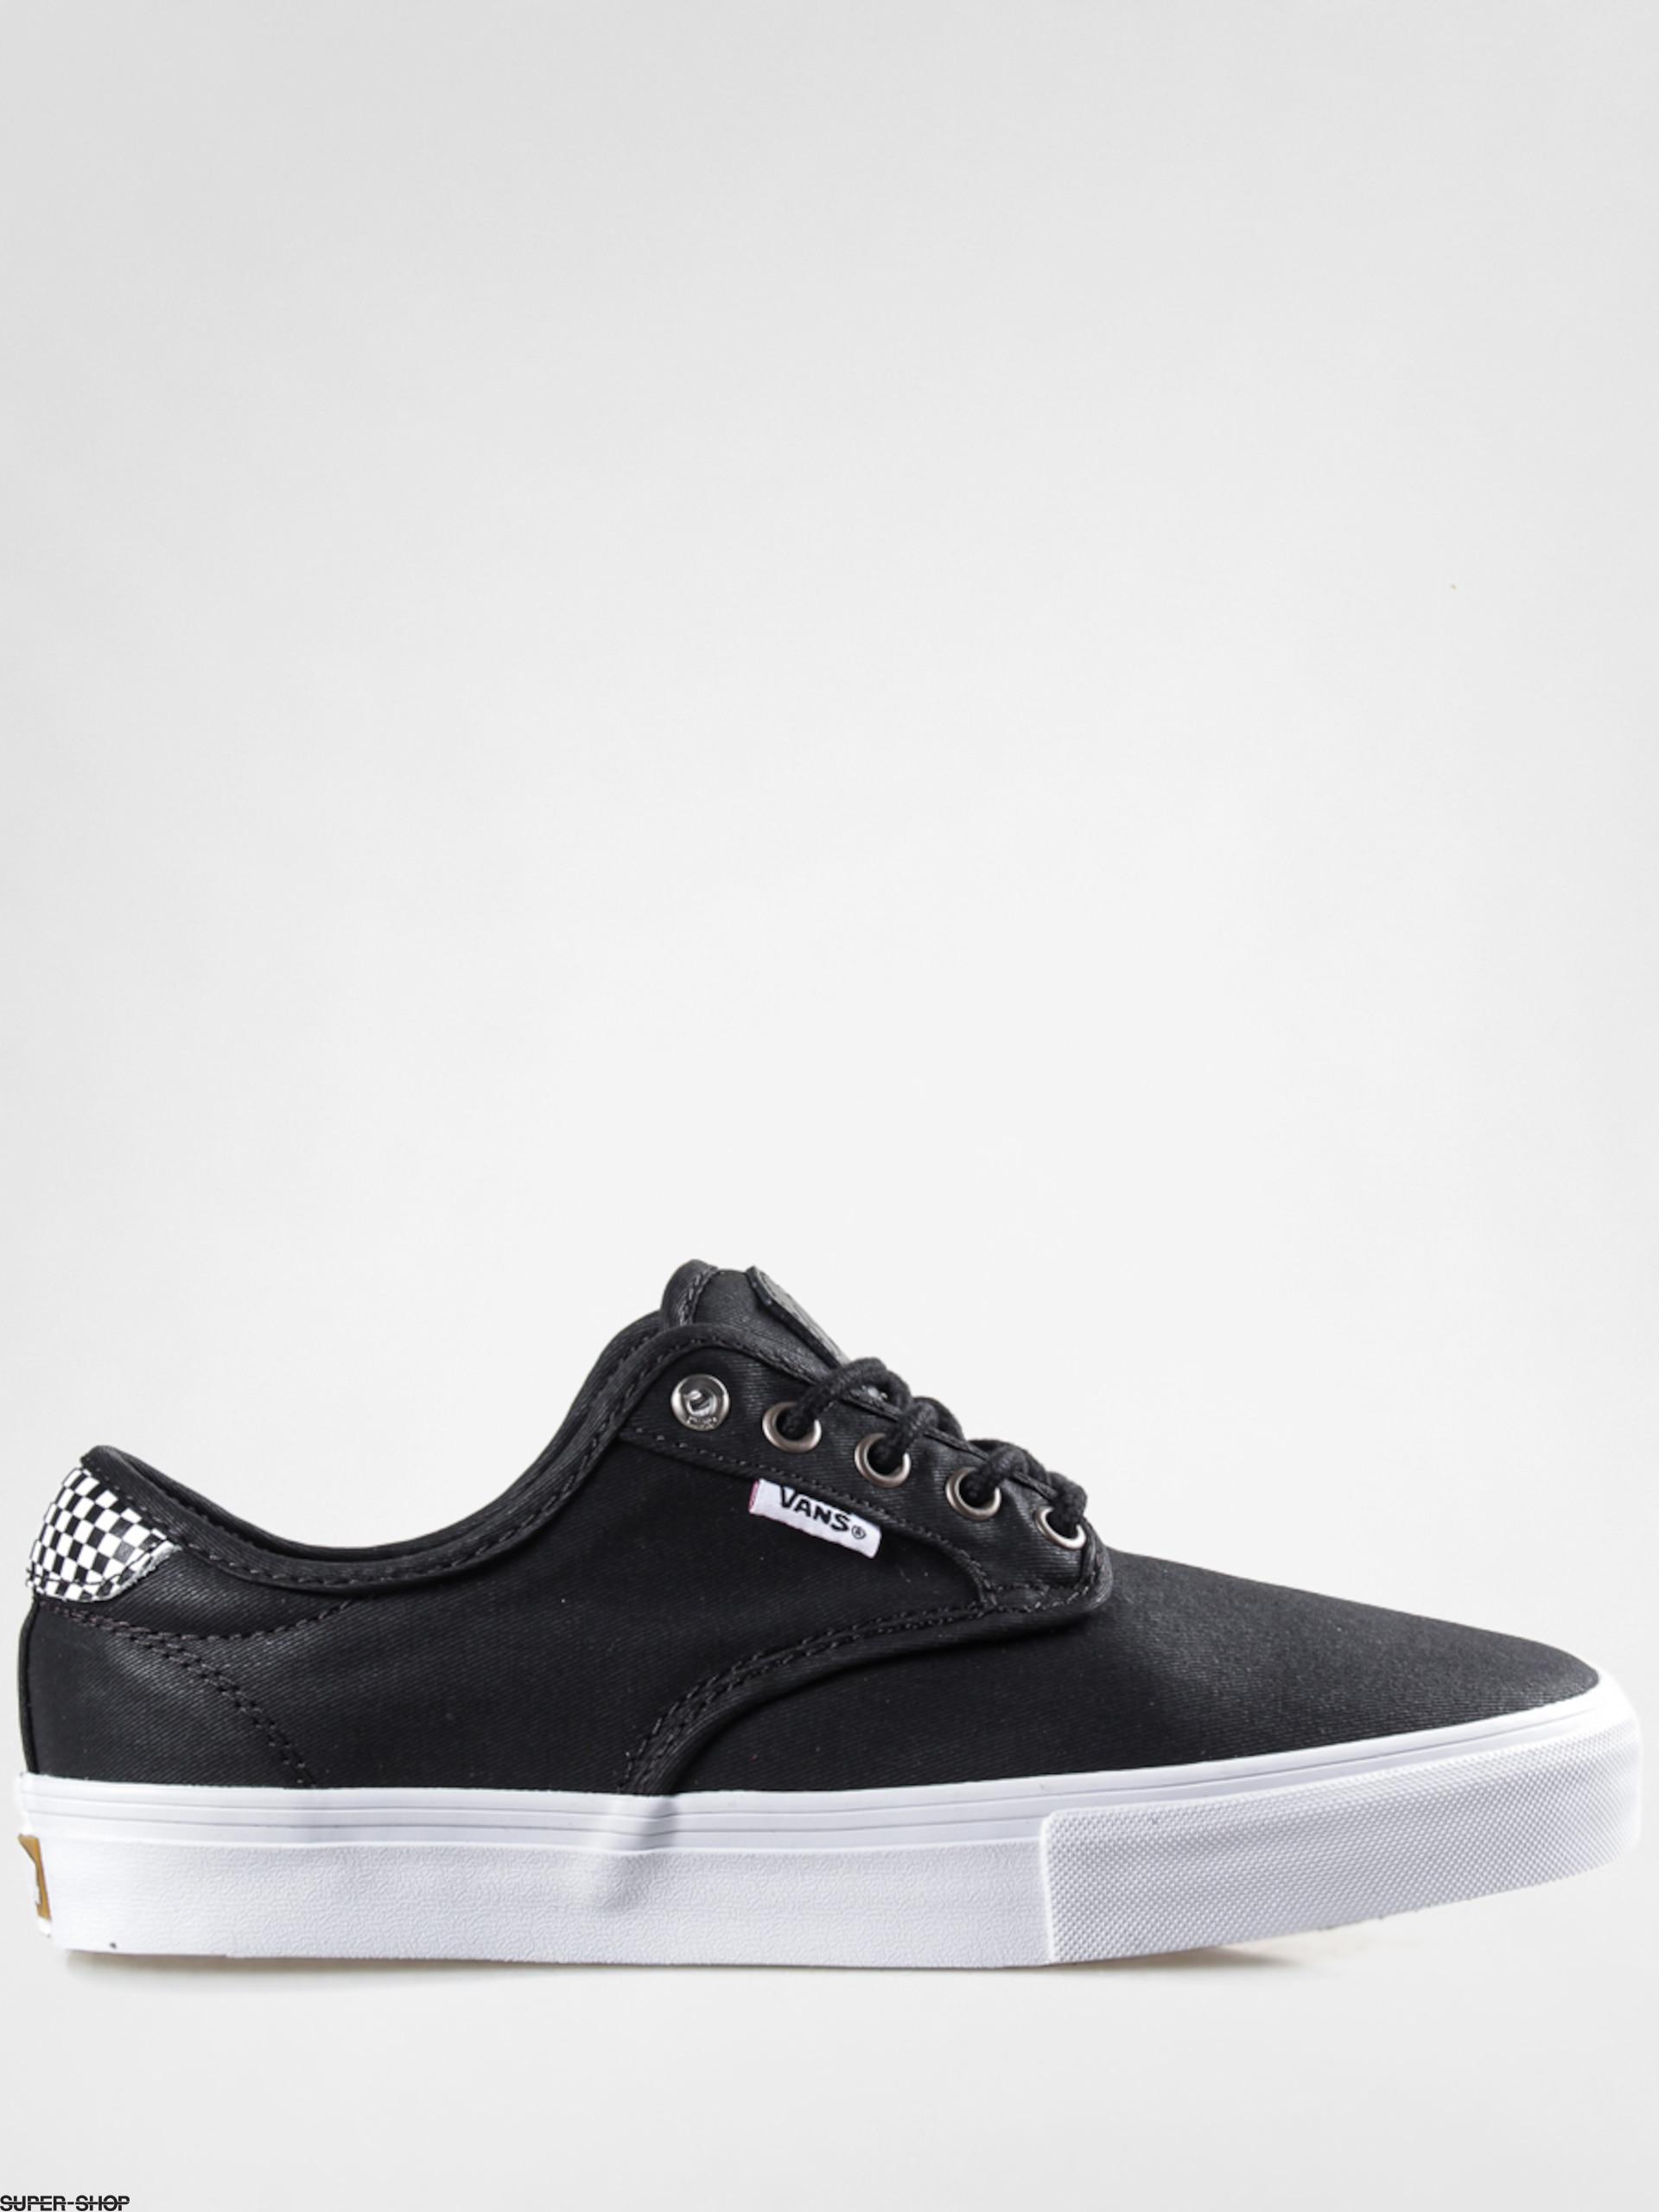 Vans Shoes Chima Ferguson Pro (waxed twill/blk/checkers)